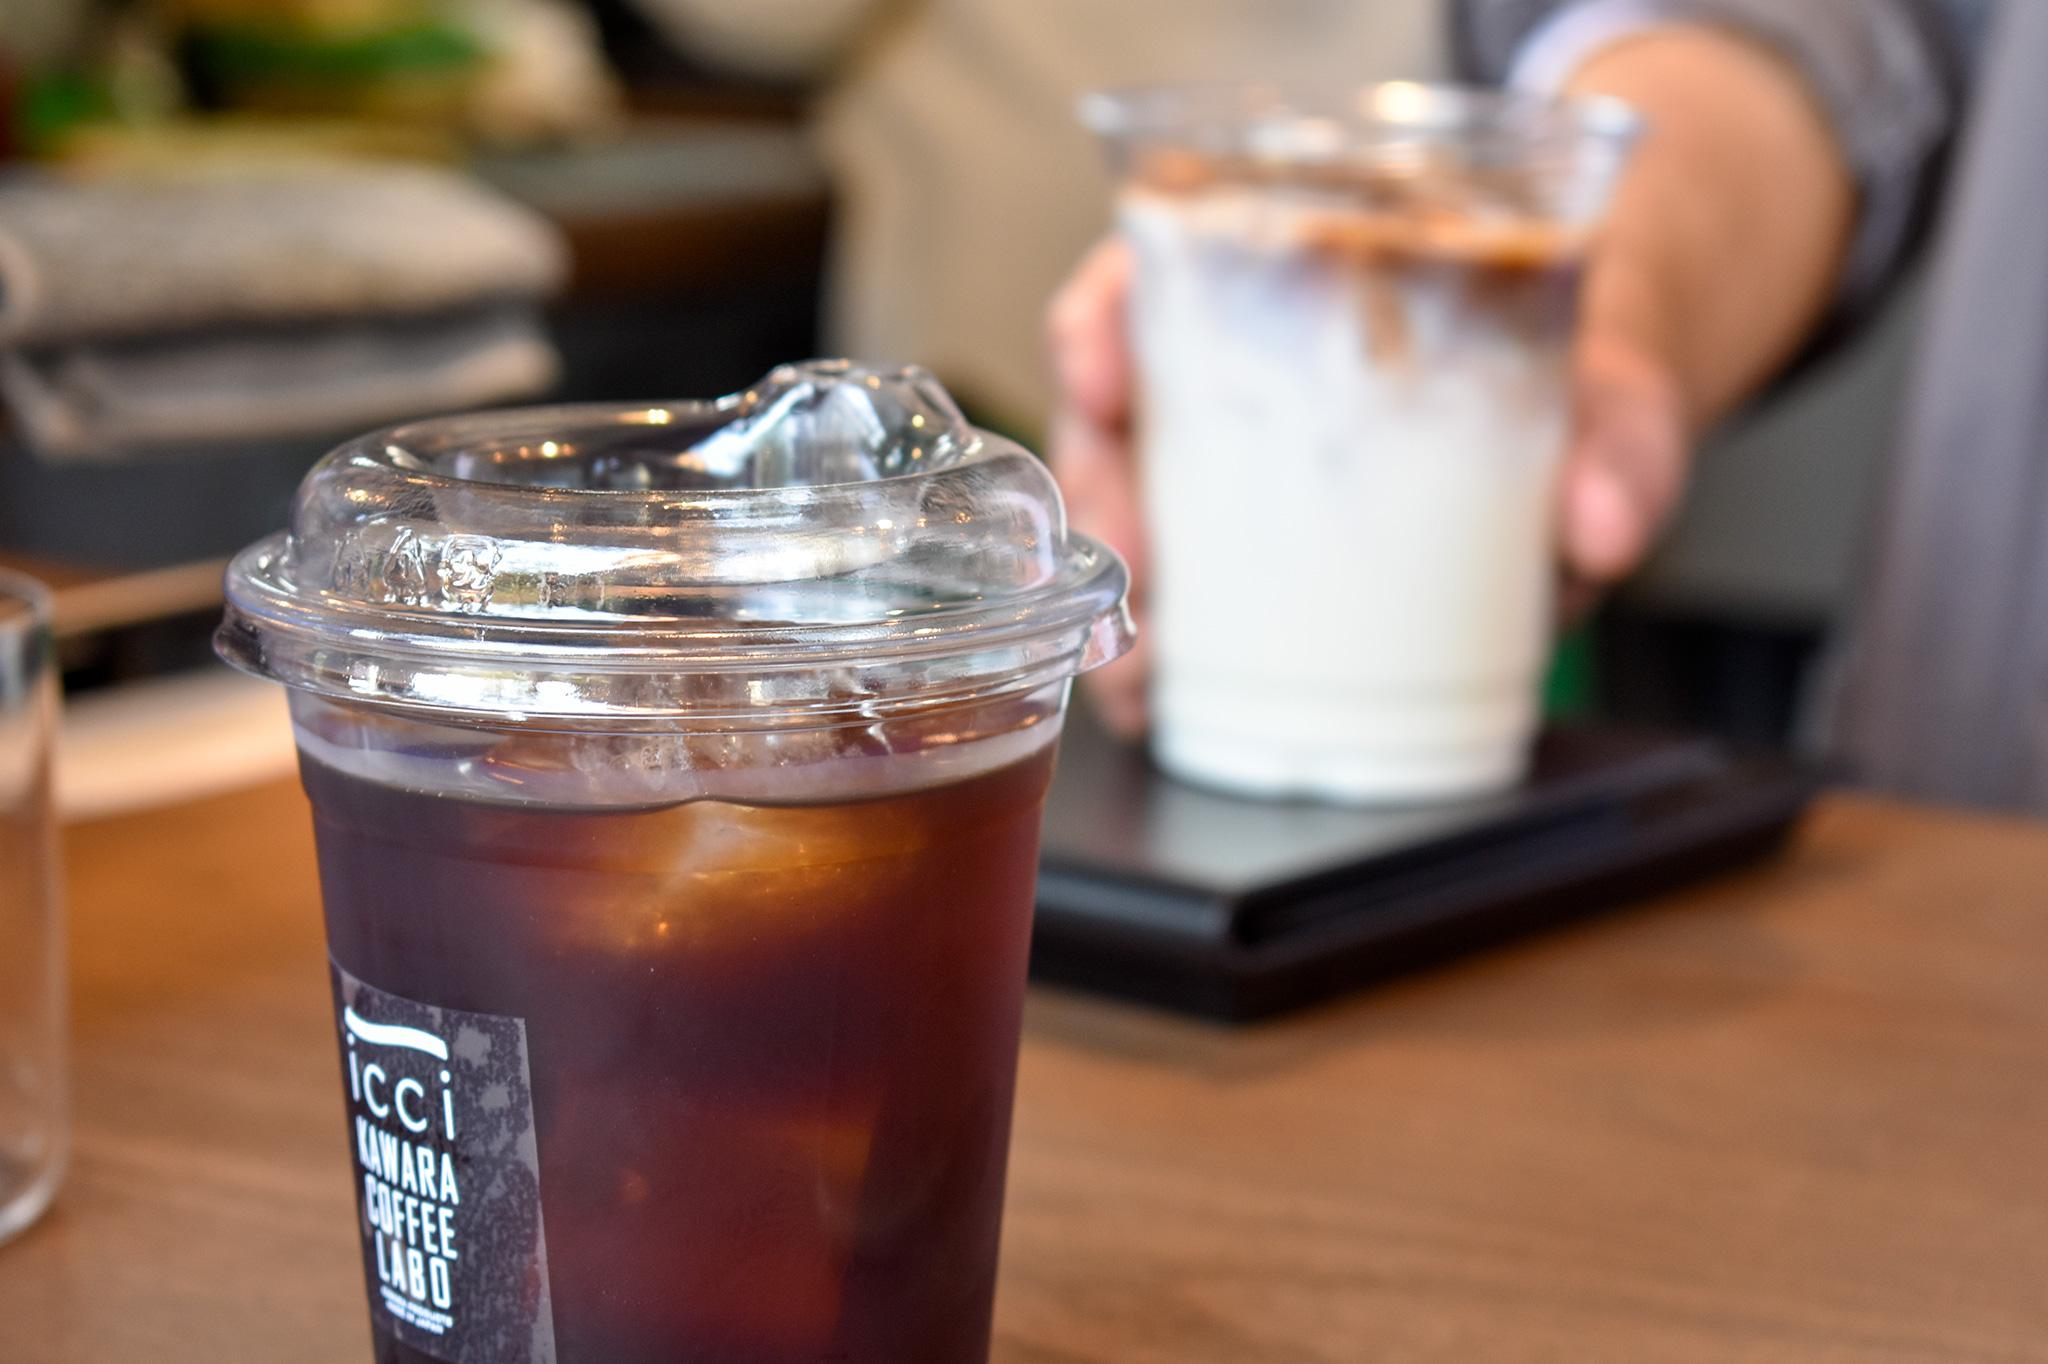 Icci KAWARA COFFEE LABO 写真5